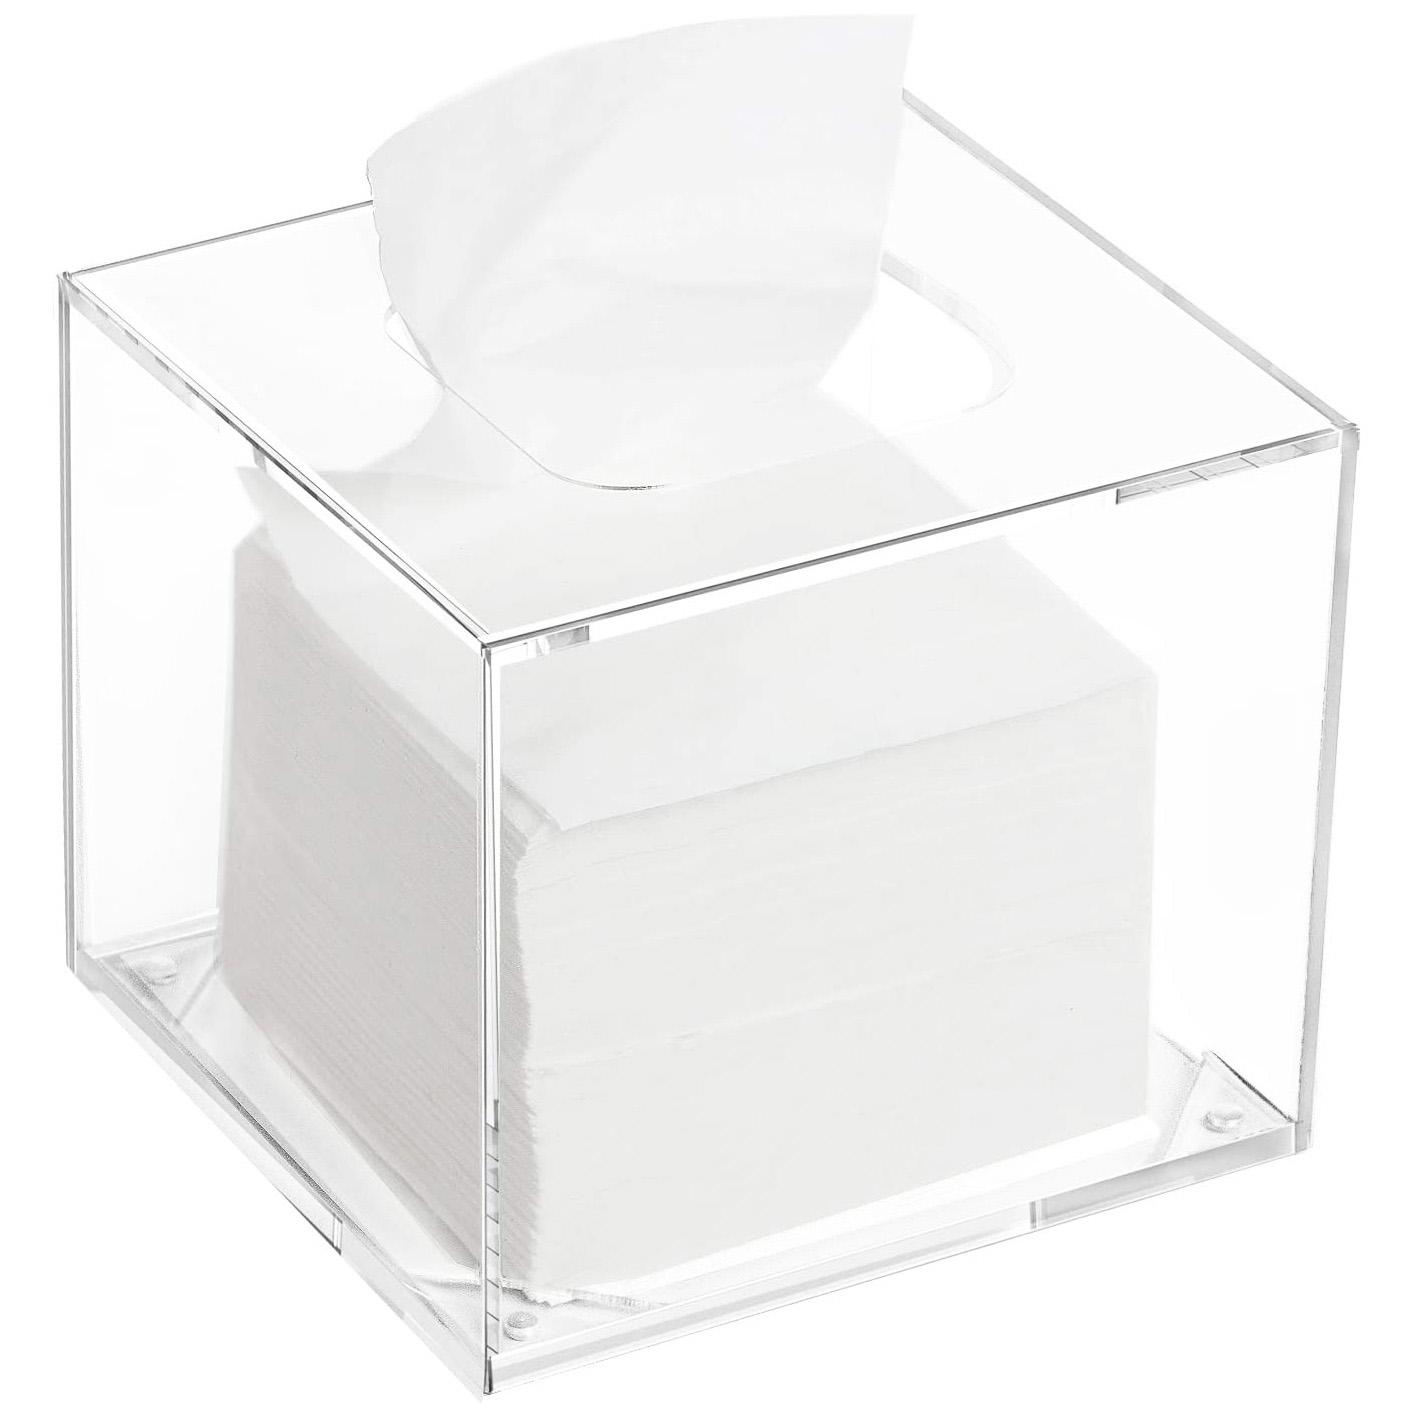 Clear Acrylic Square Napkin Organizer for Bathroom & Living Room